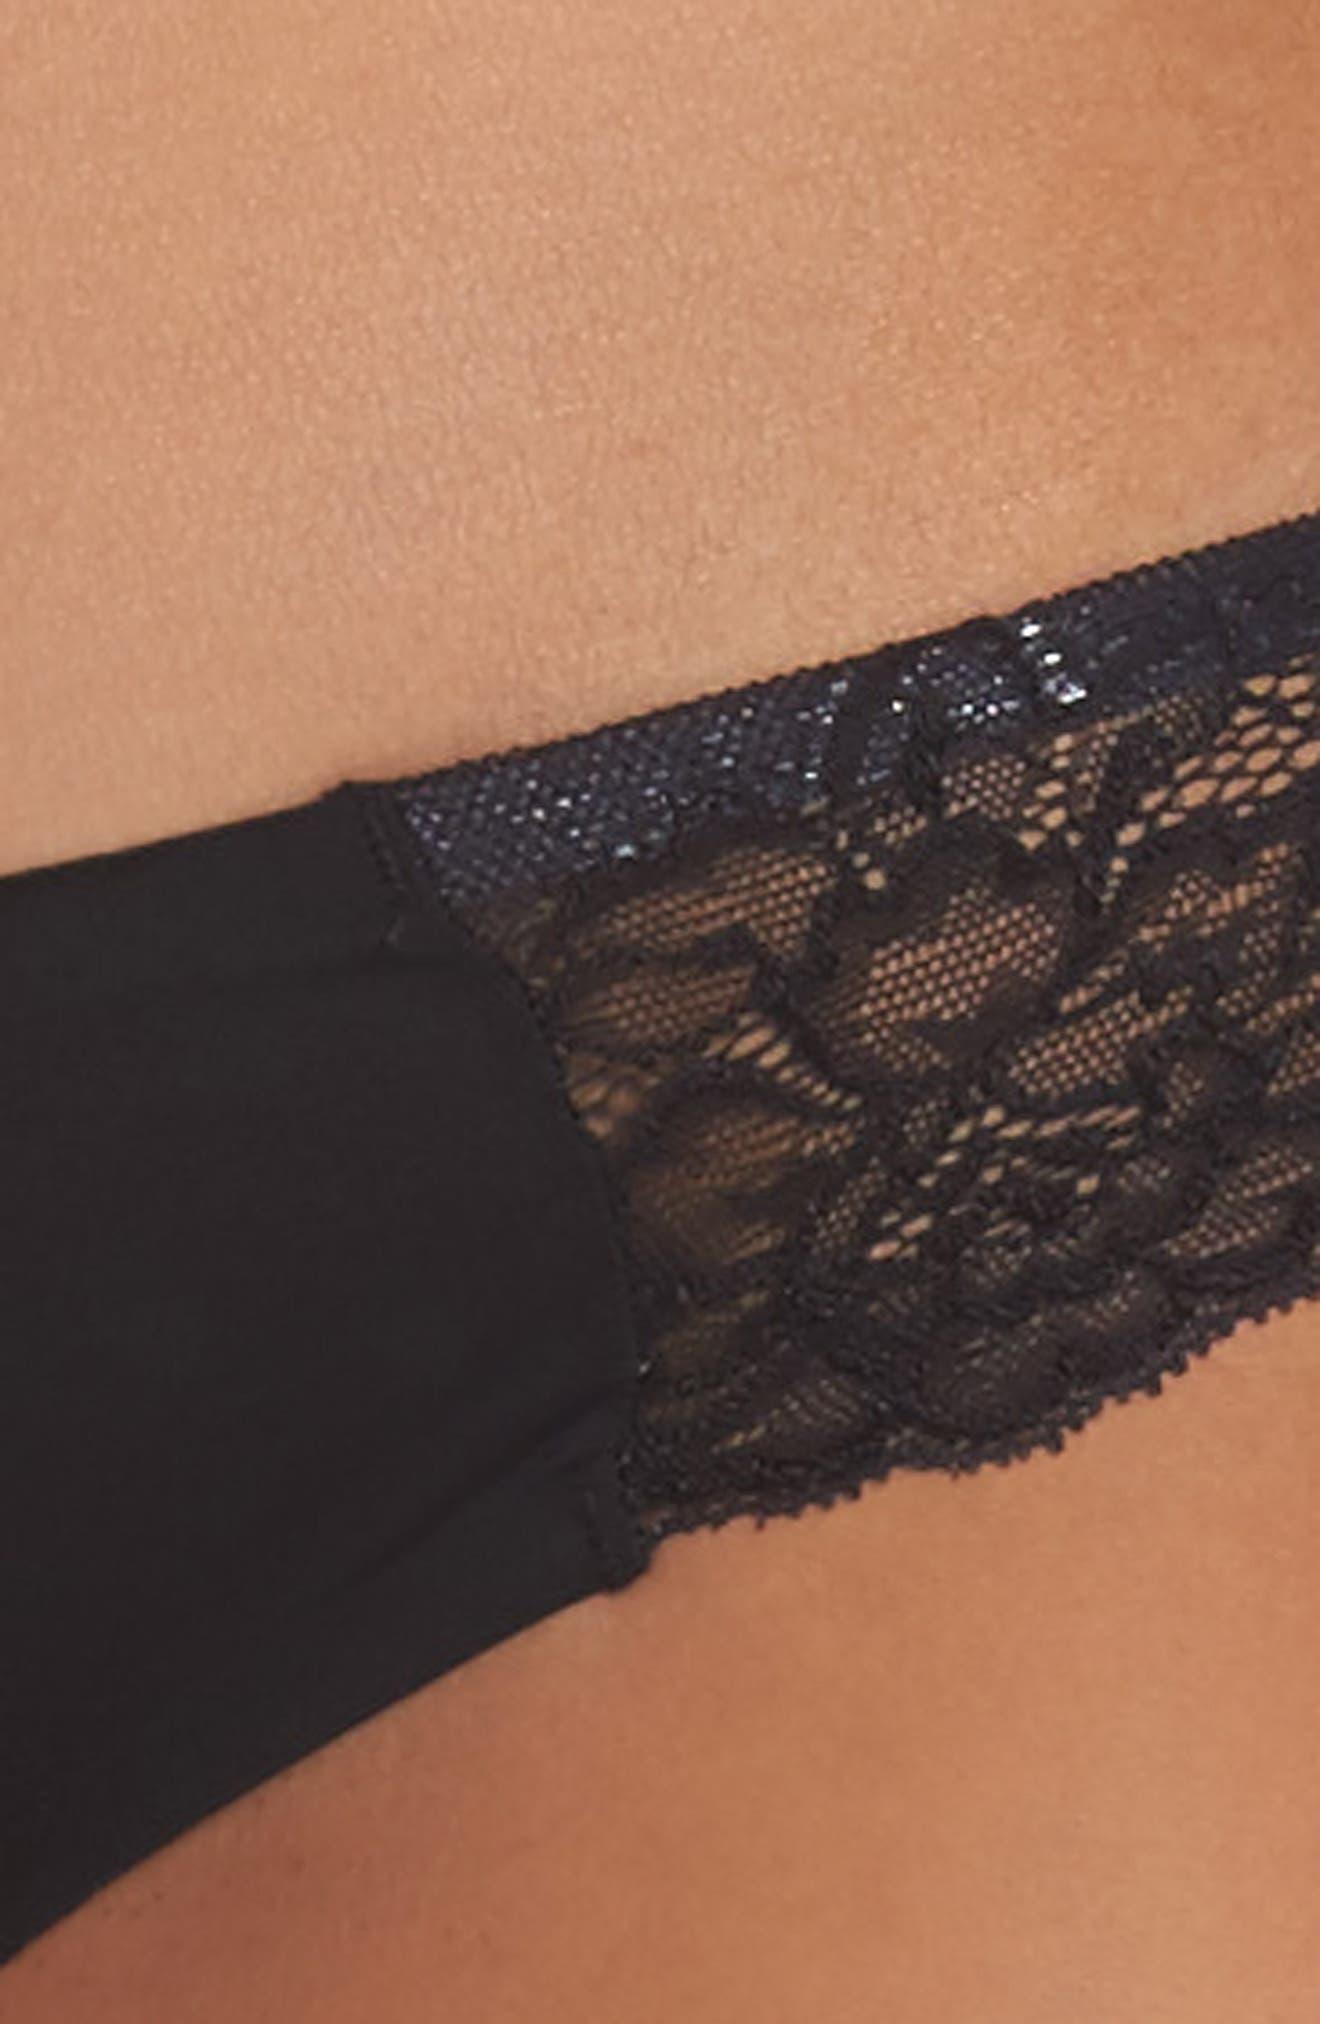 Intimately FP Smooth Bikini,                             Alternate thumbnail 4, color,                             001